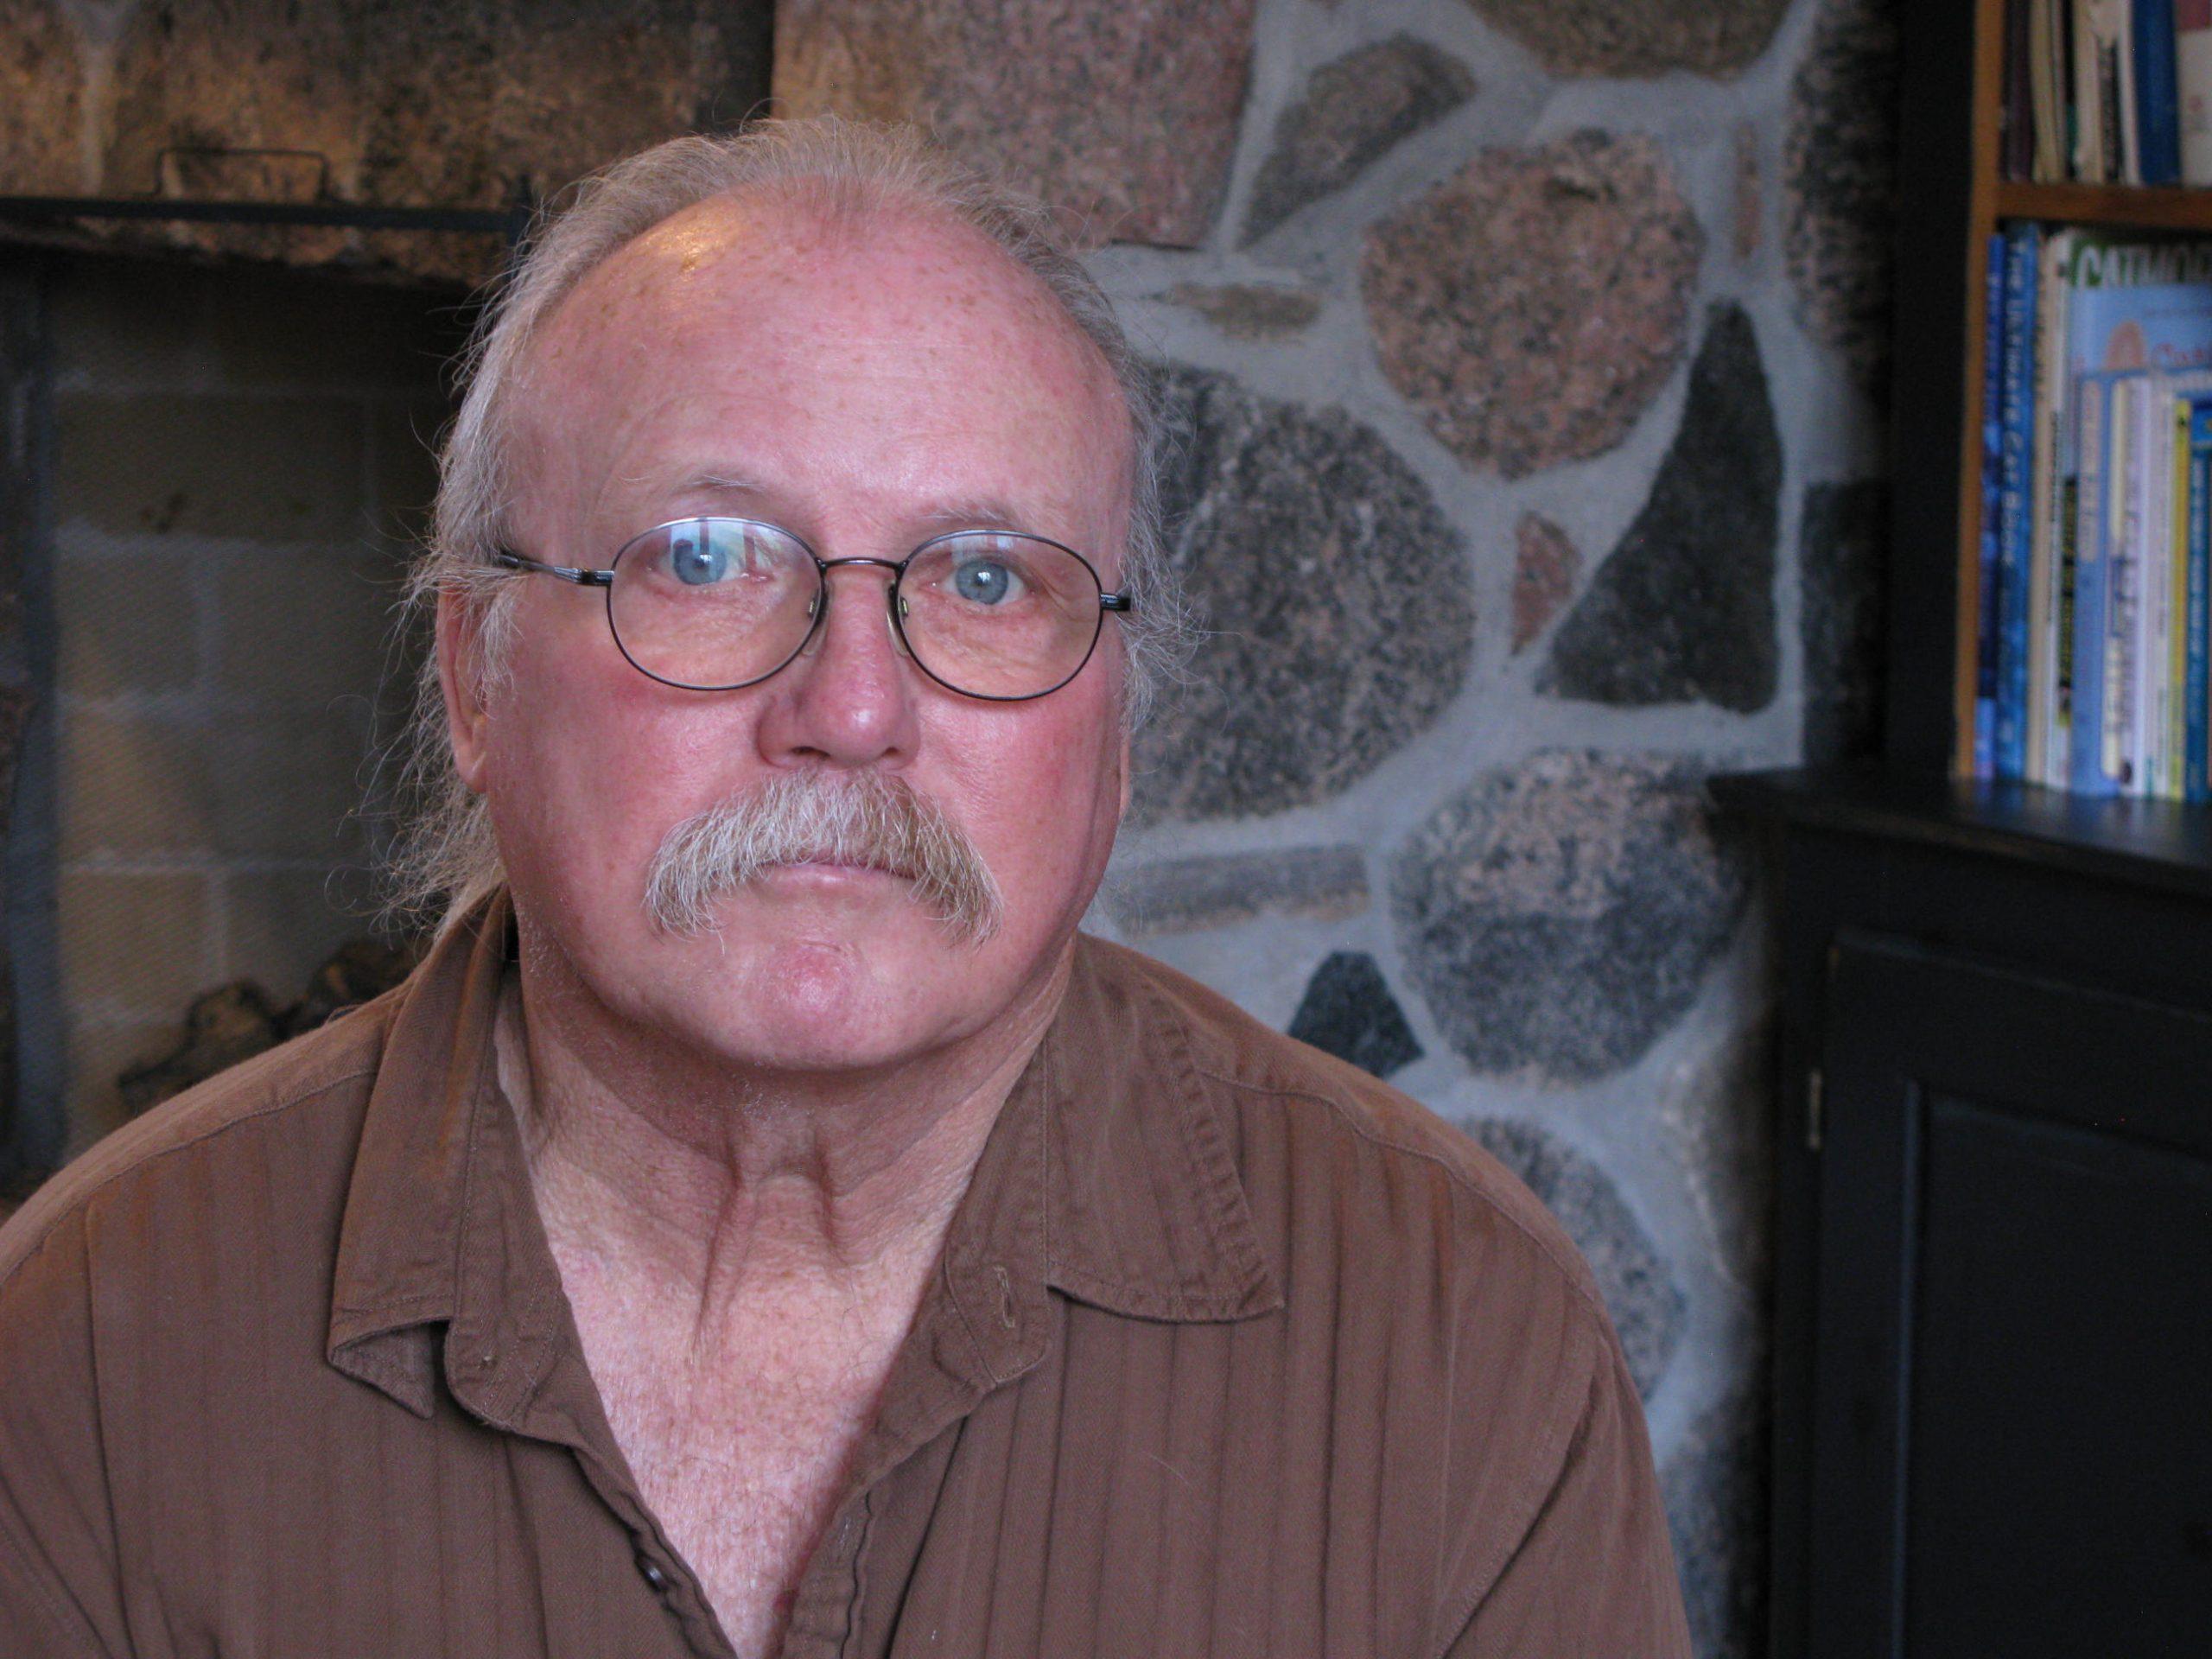 Renowned human rights activist to give free public talk at Okanagan College